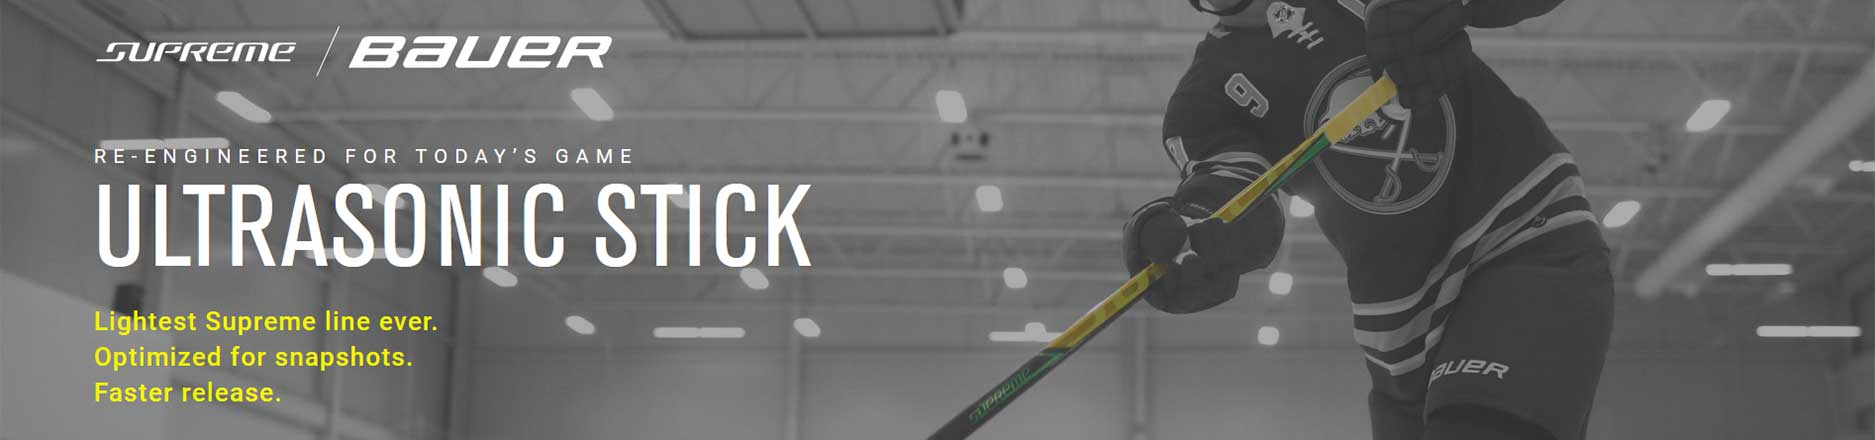 Bauer Supreme Ultrasonic hockey sticks